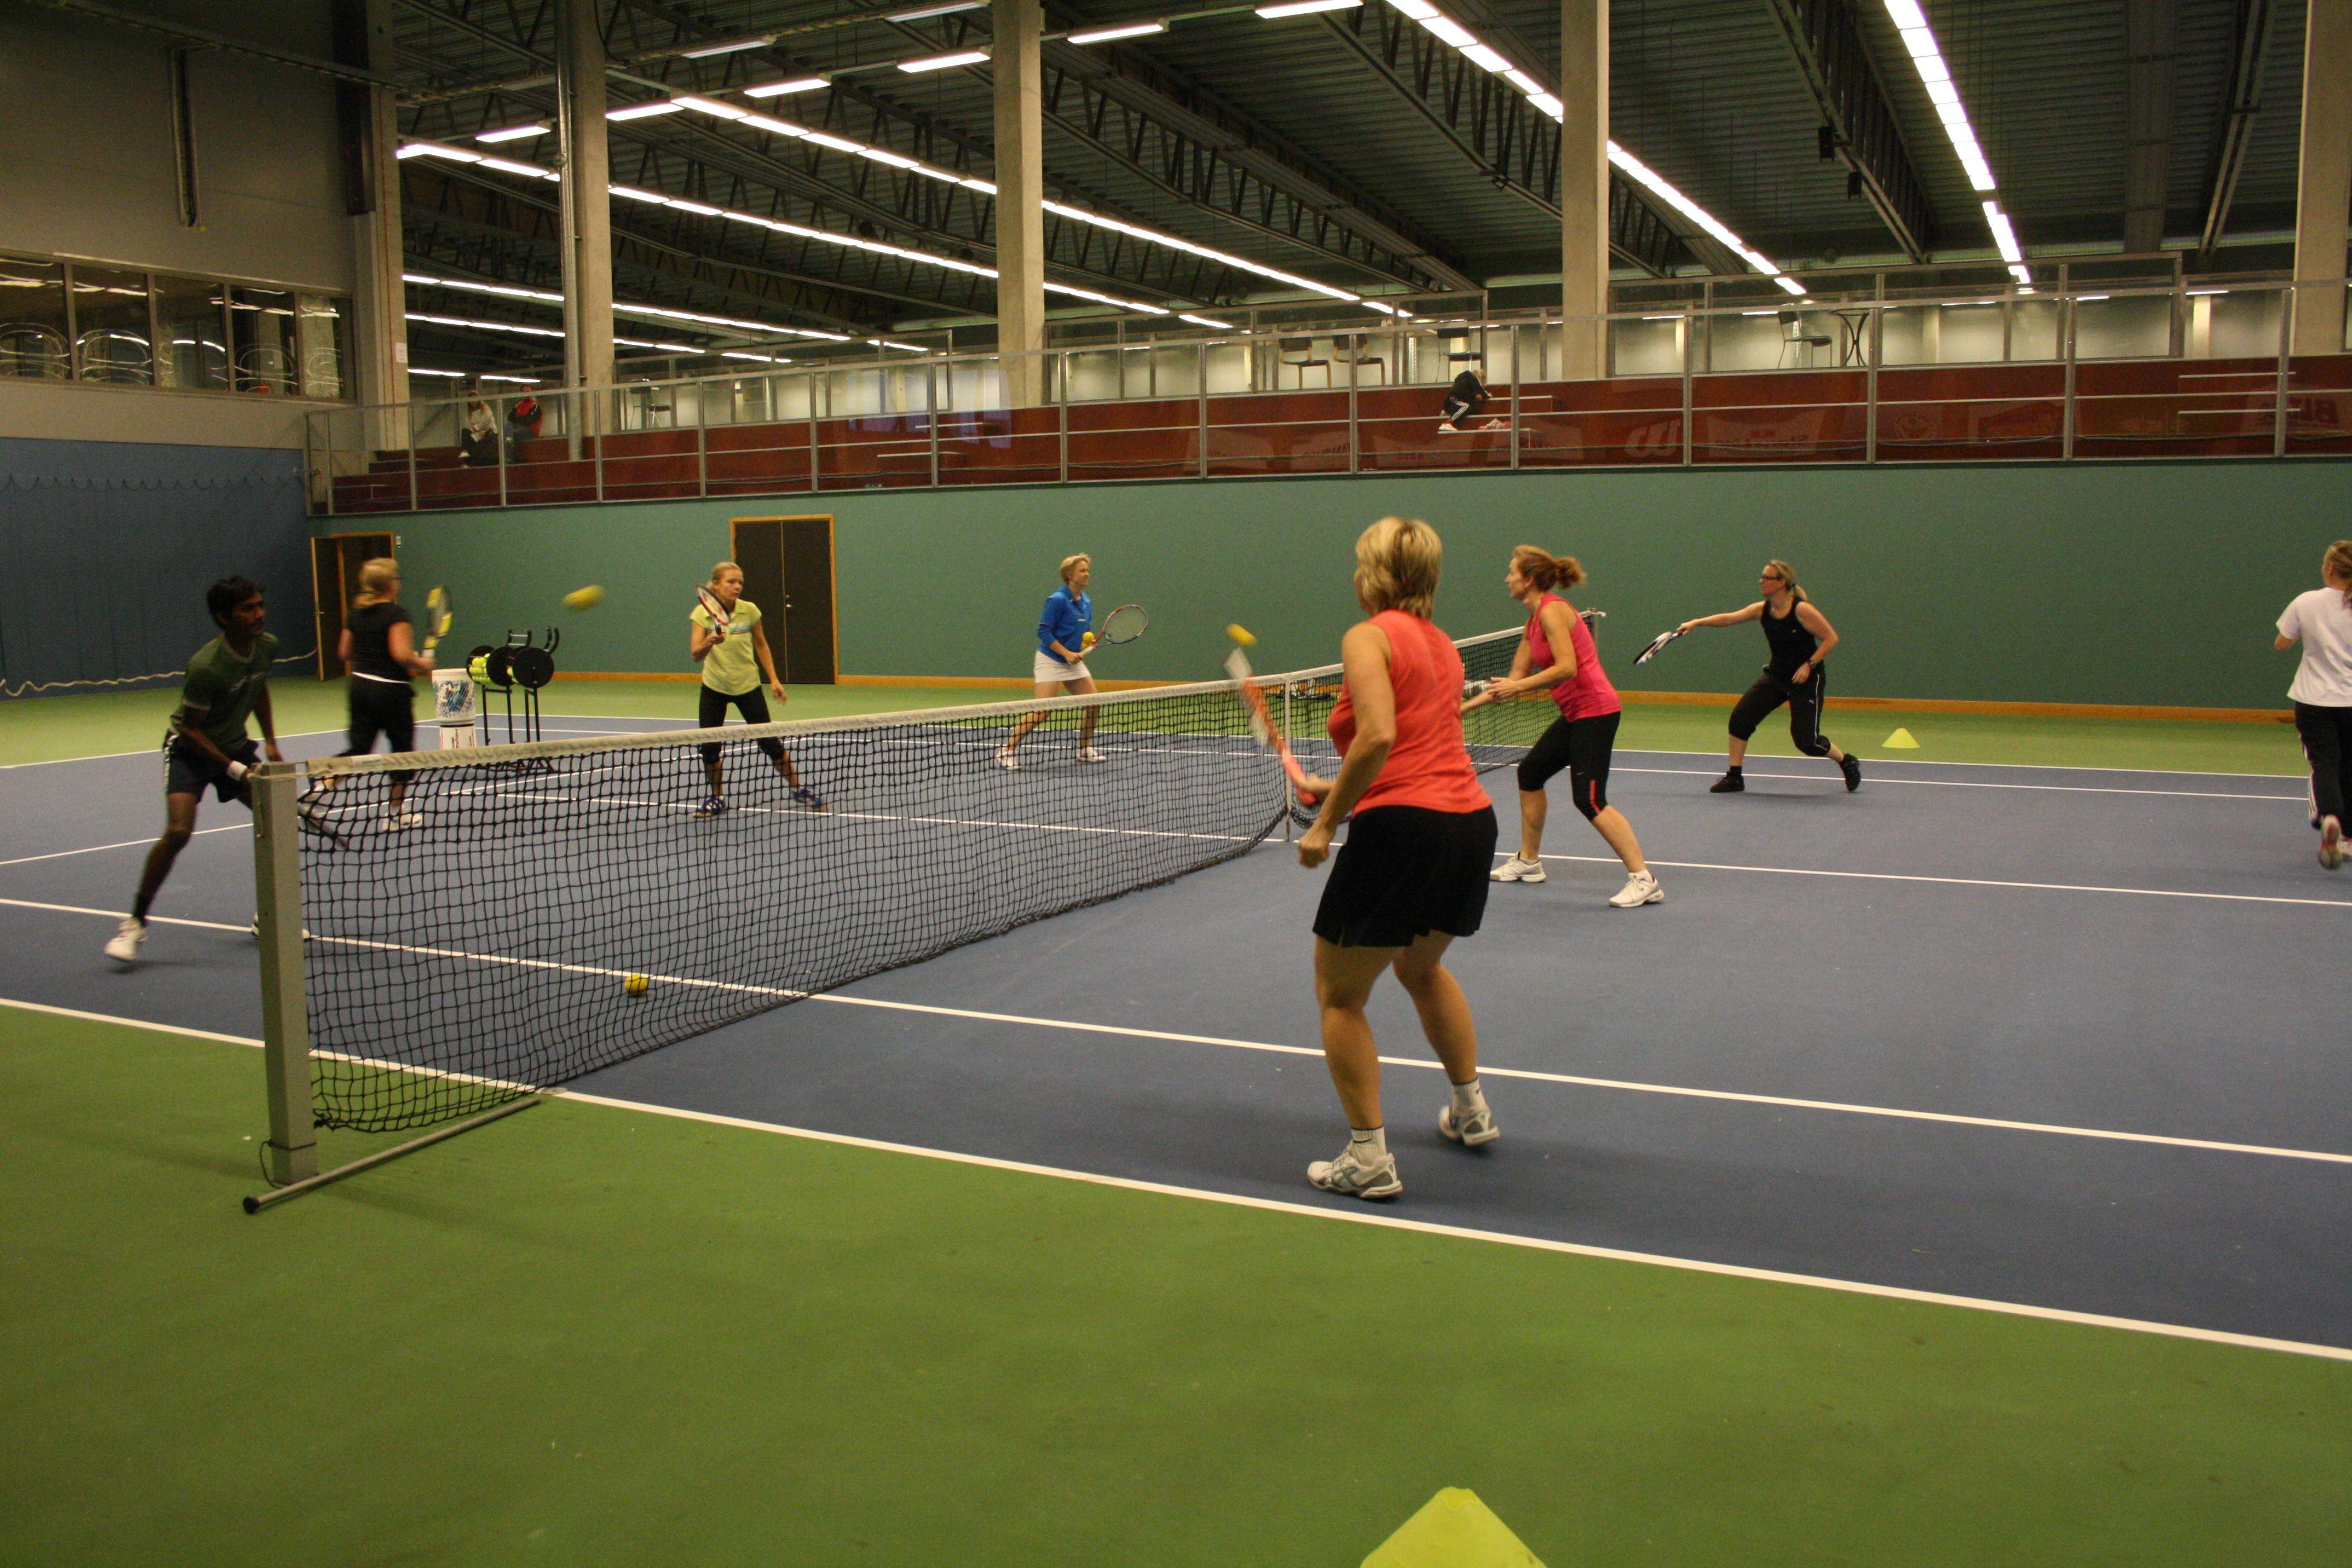 Tennis - Karlskrona Tennisklubb